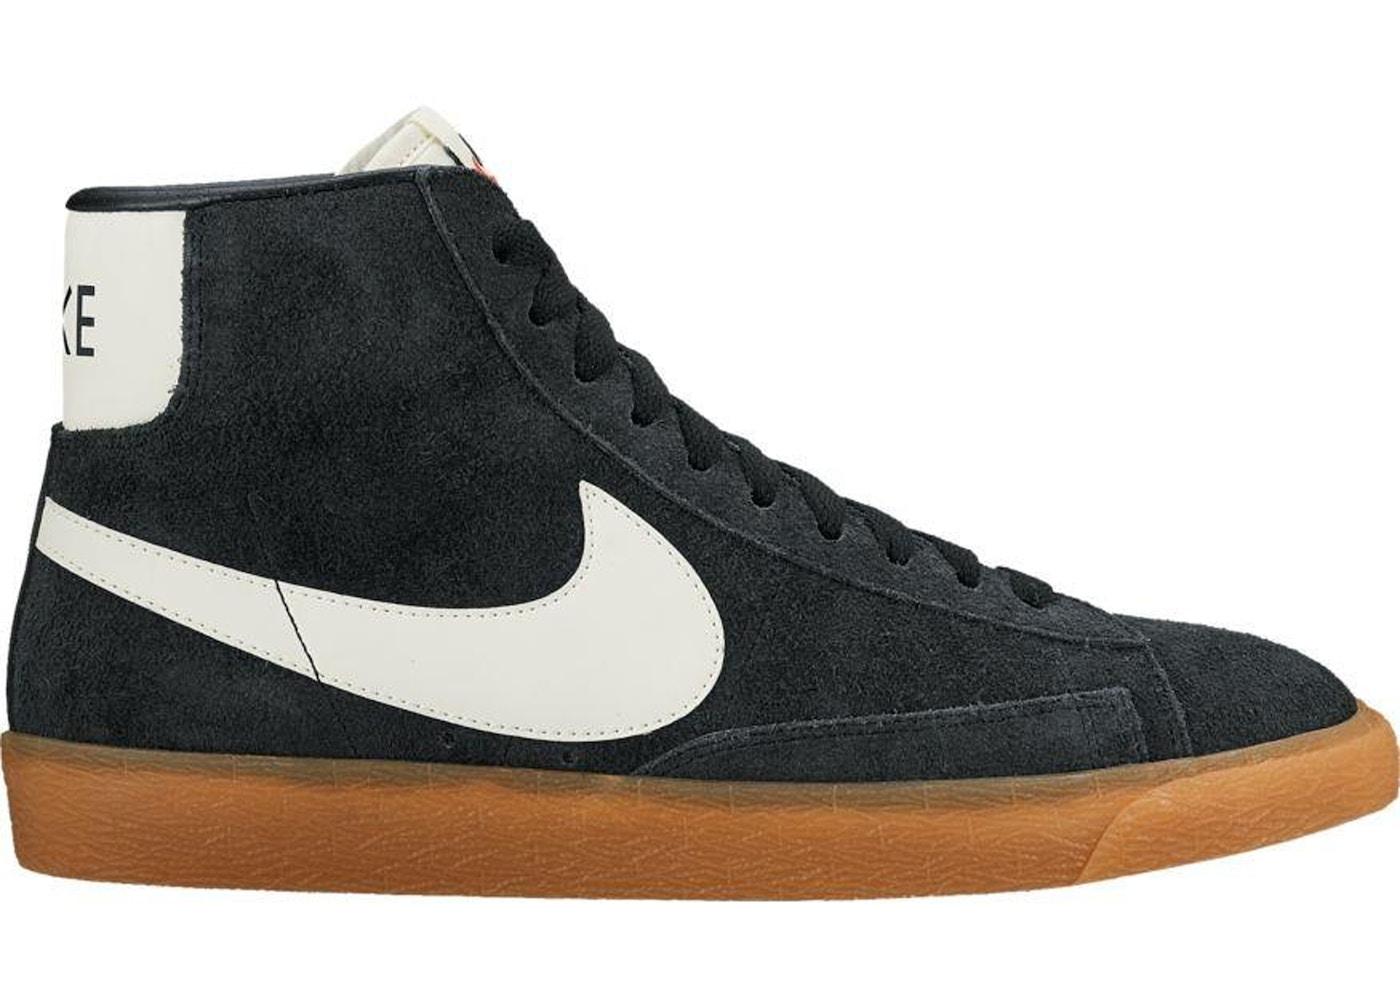 Privilegiado Adiós películas  Nike Blazer Mid Suede Vintage Black White Gum (W) - 518171-017